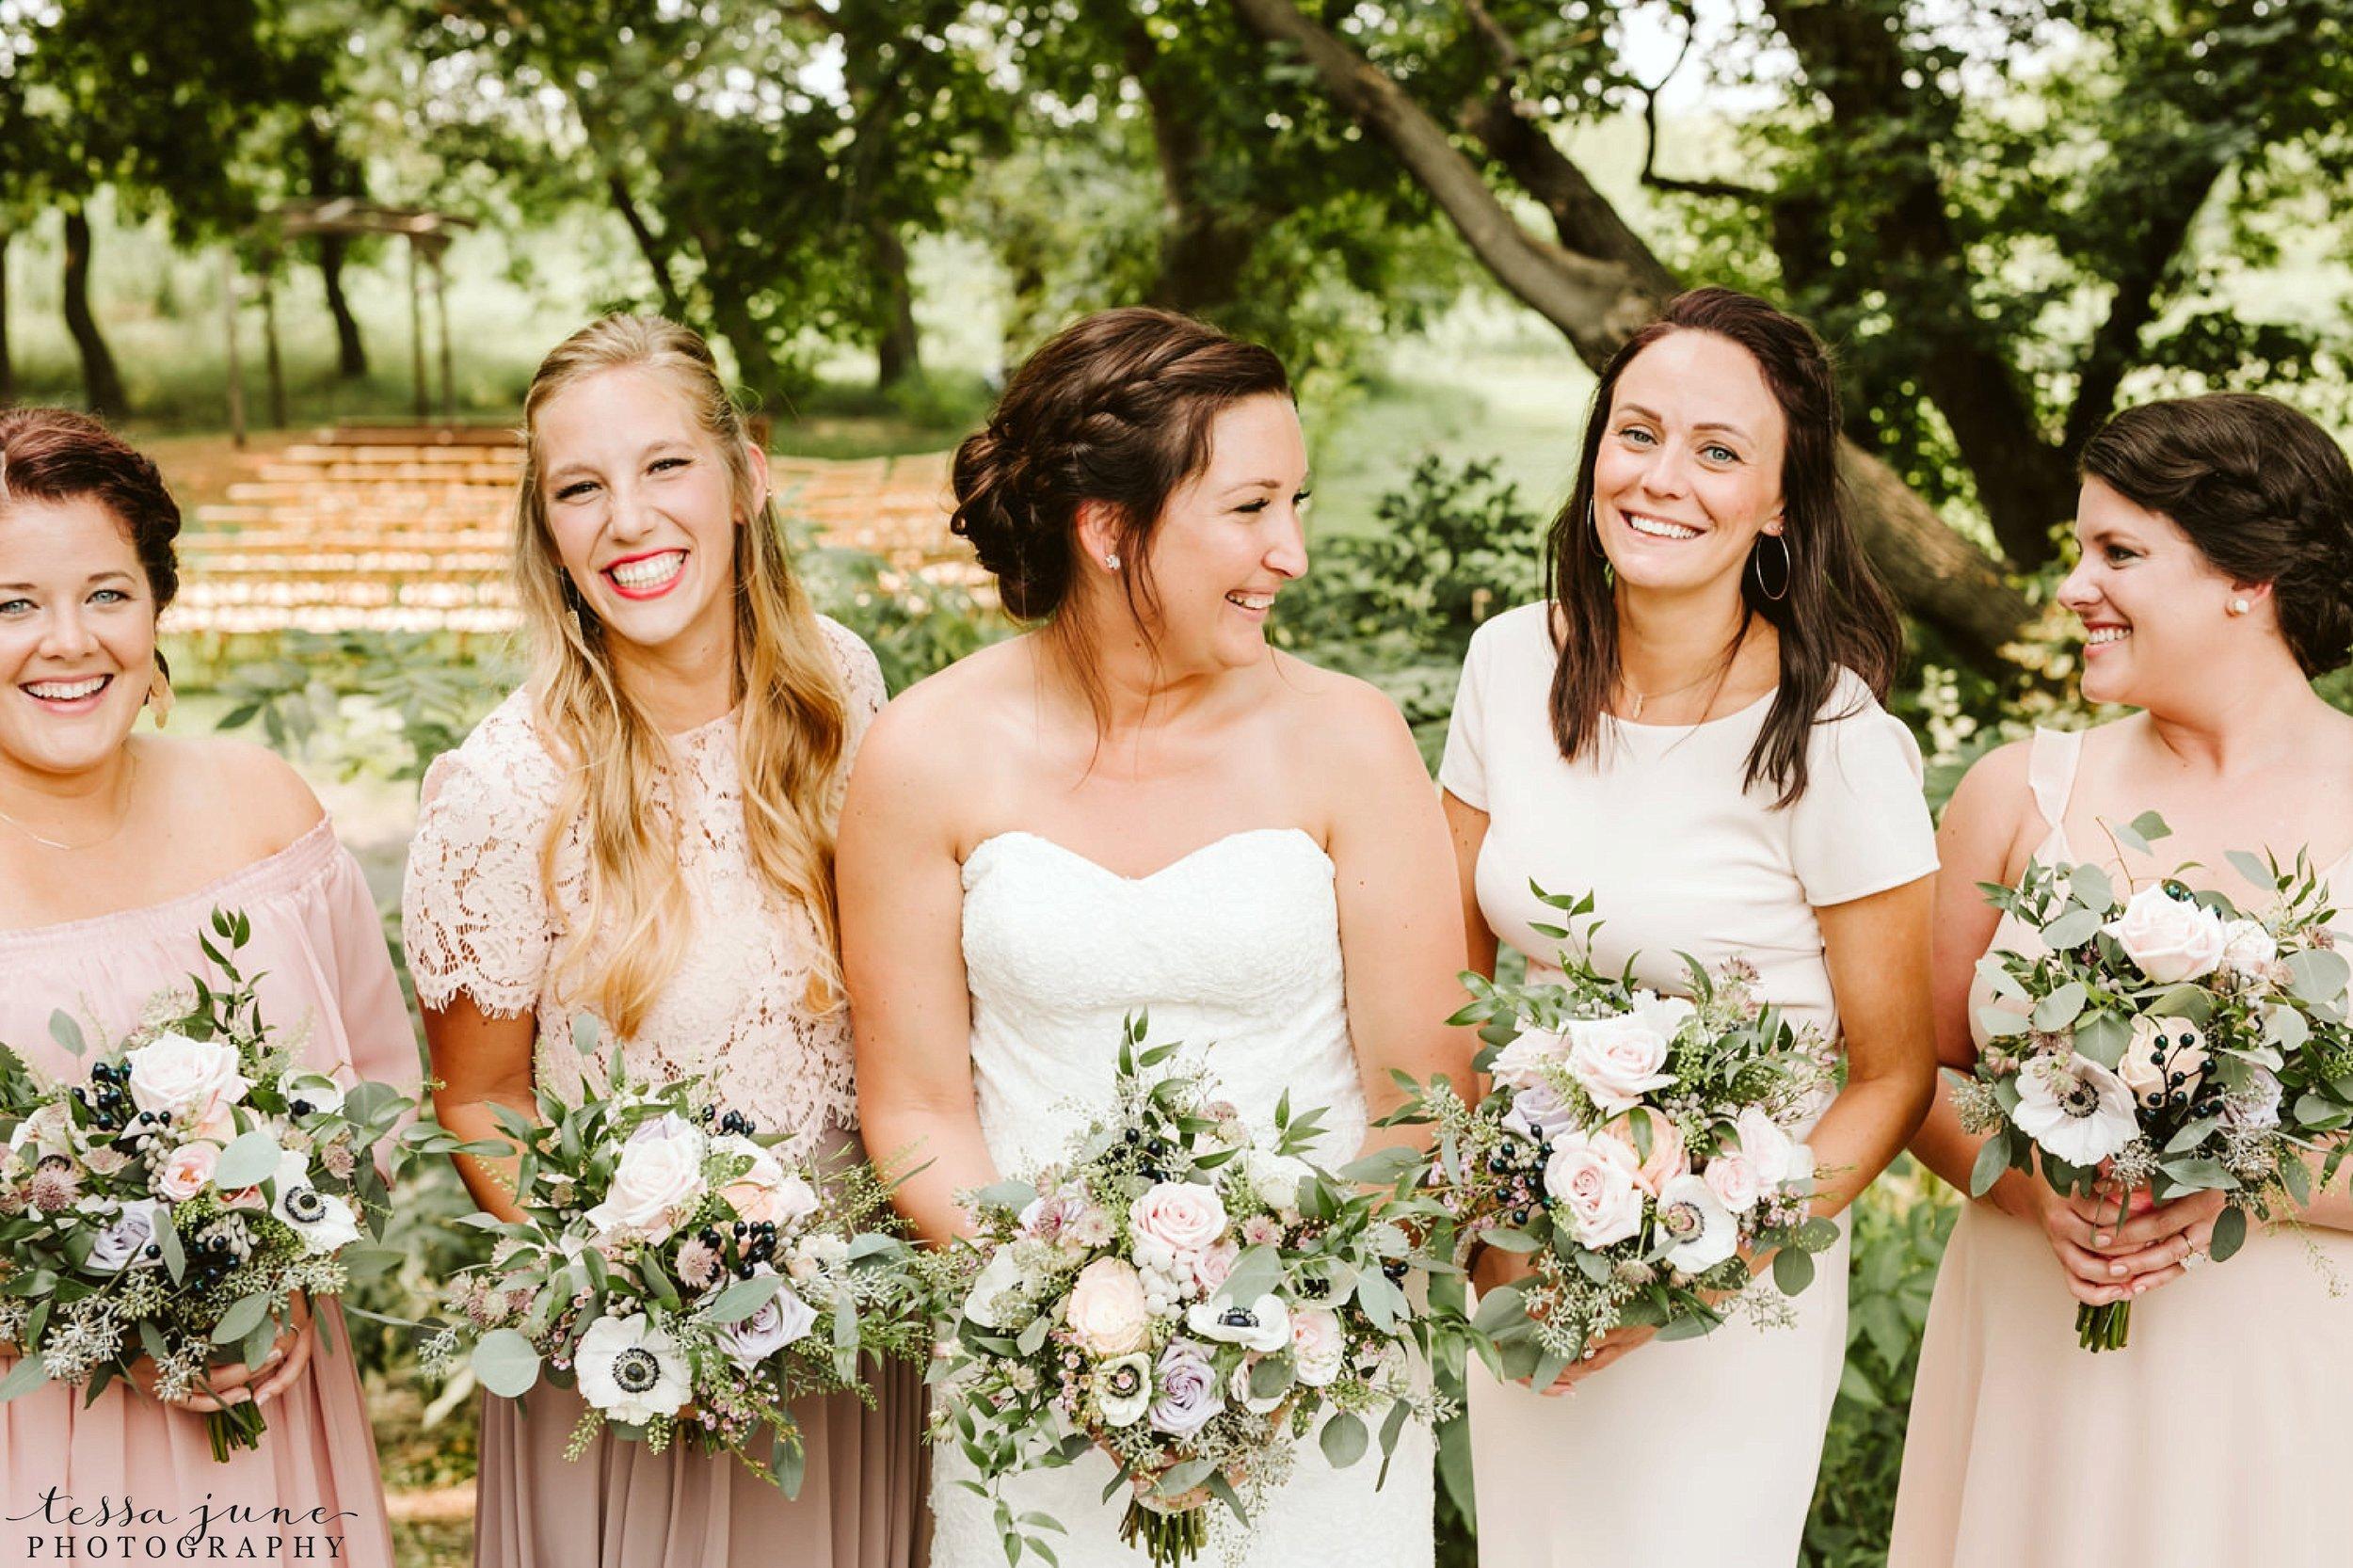 gathered-oaks-barn-wedding-alexandria-minnesota-10.jpg